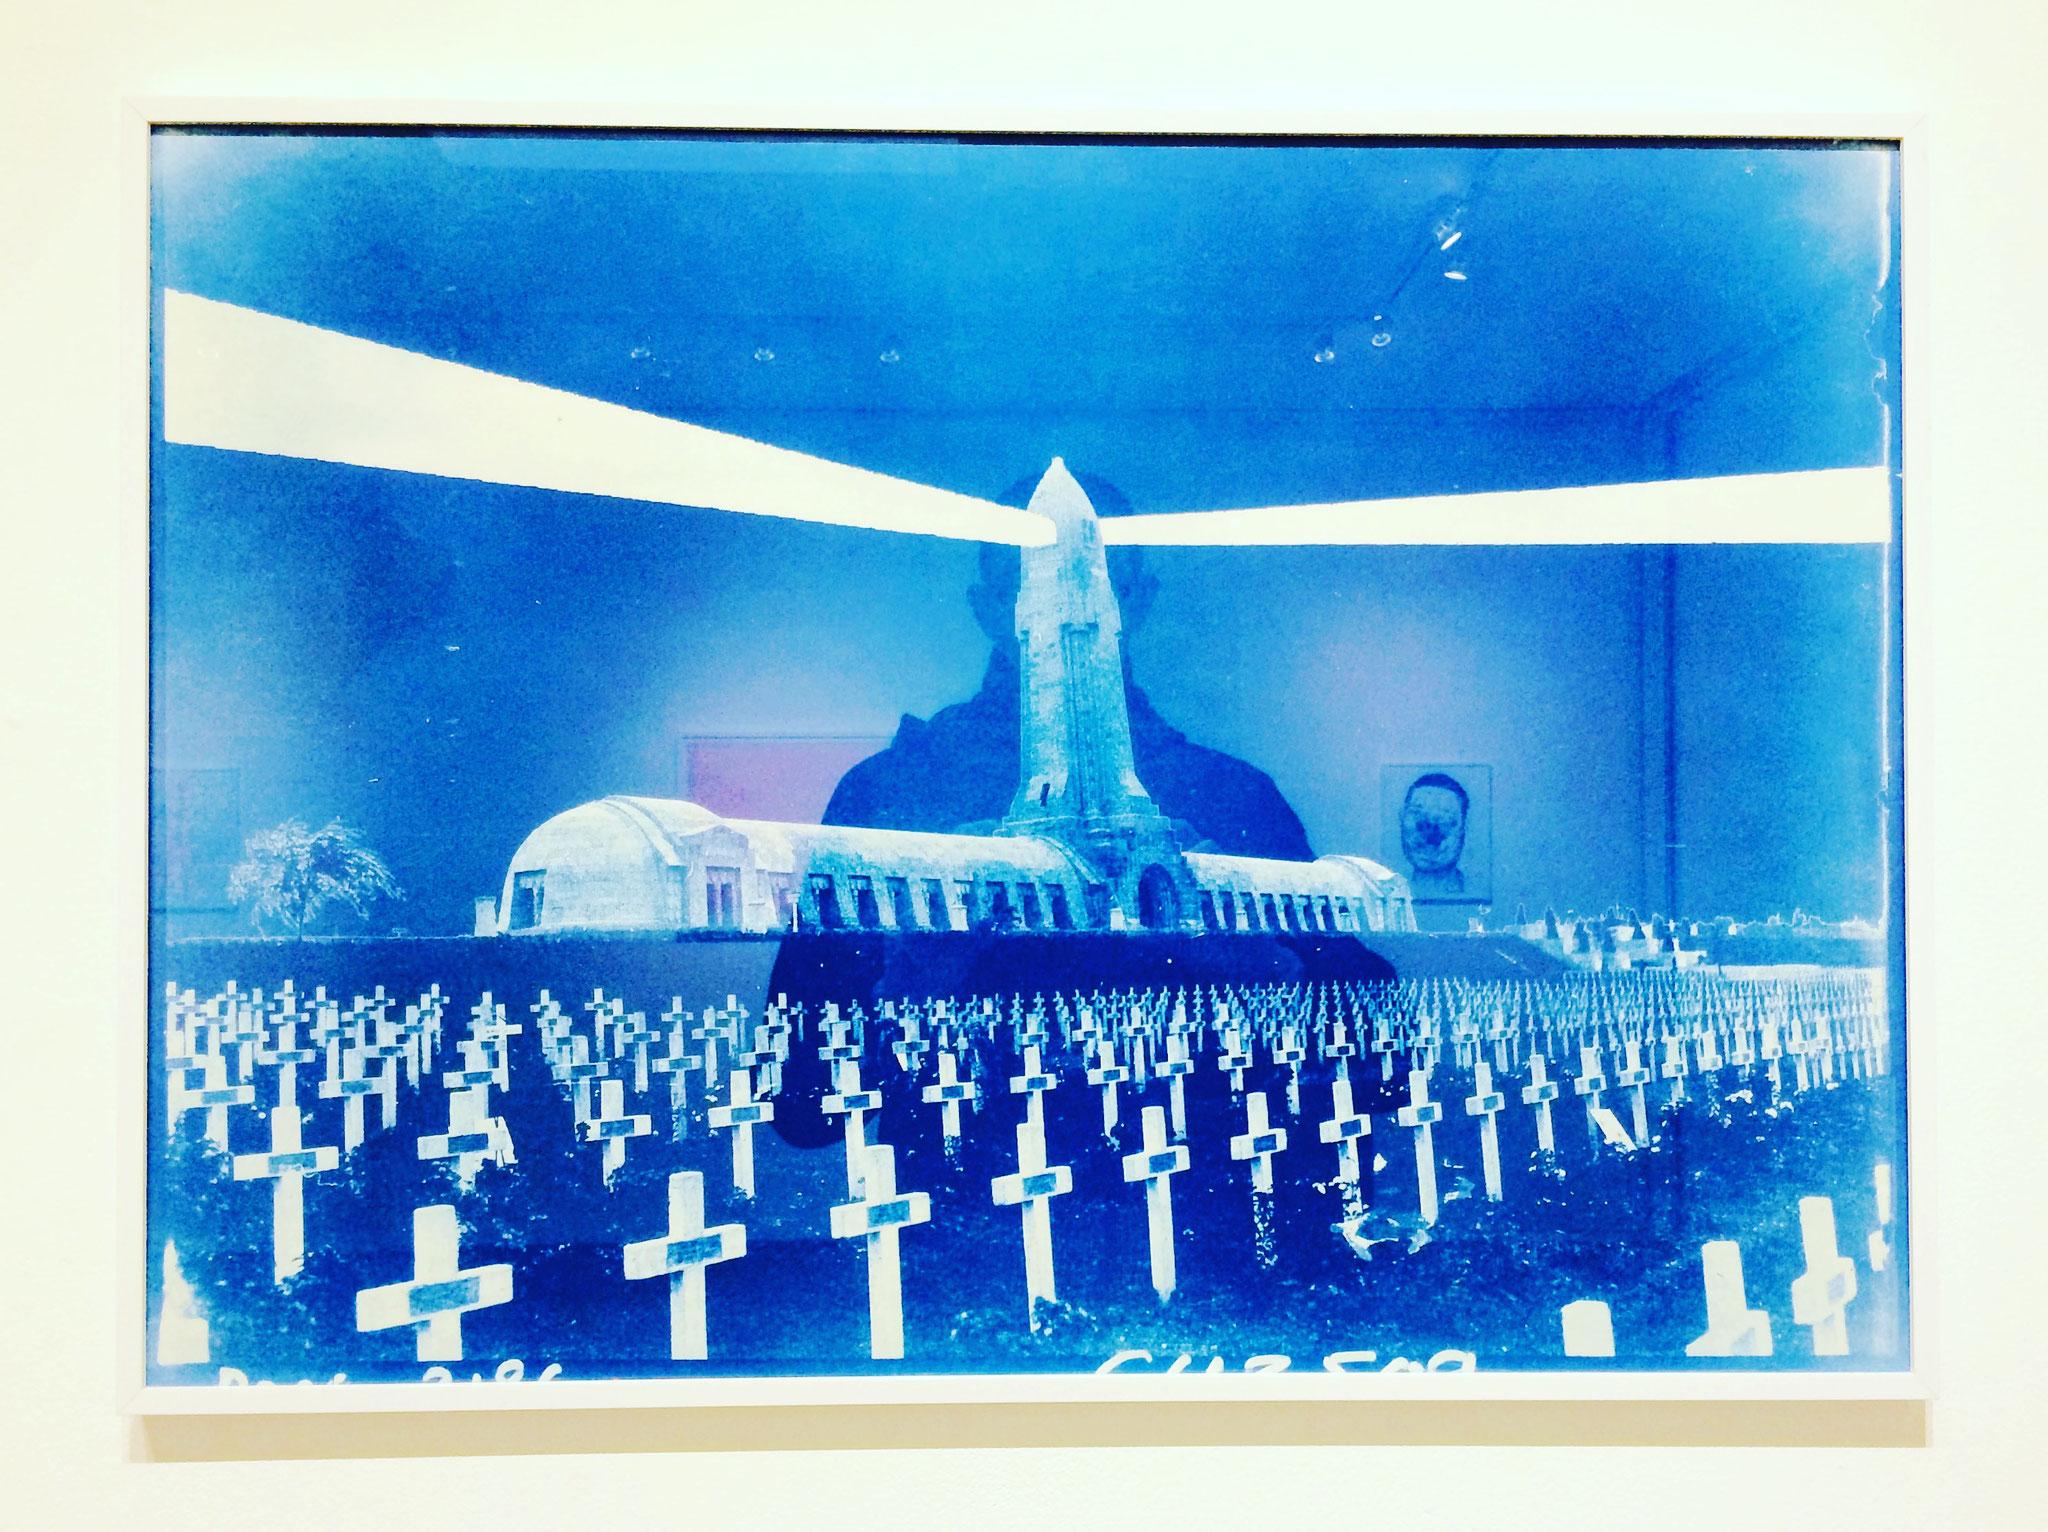 La Veille, 2017. Cyanotype, 50 x 70 cm. Photo : Loïc Creff